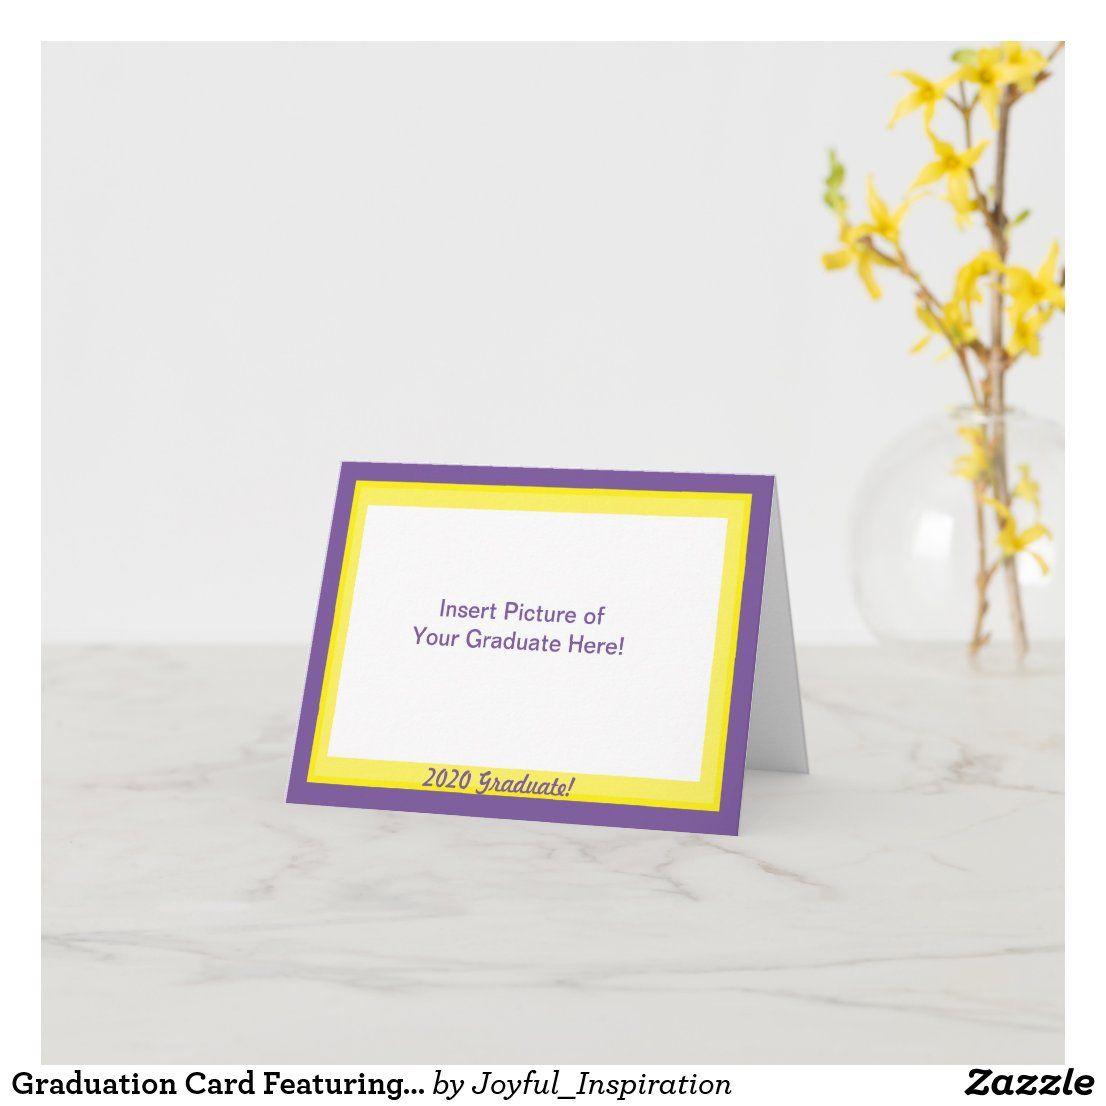 Graduation card featuring your graduate in